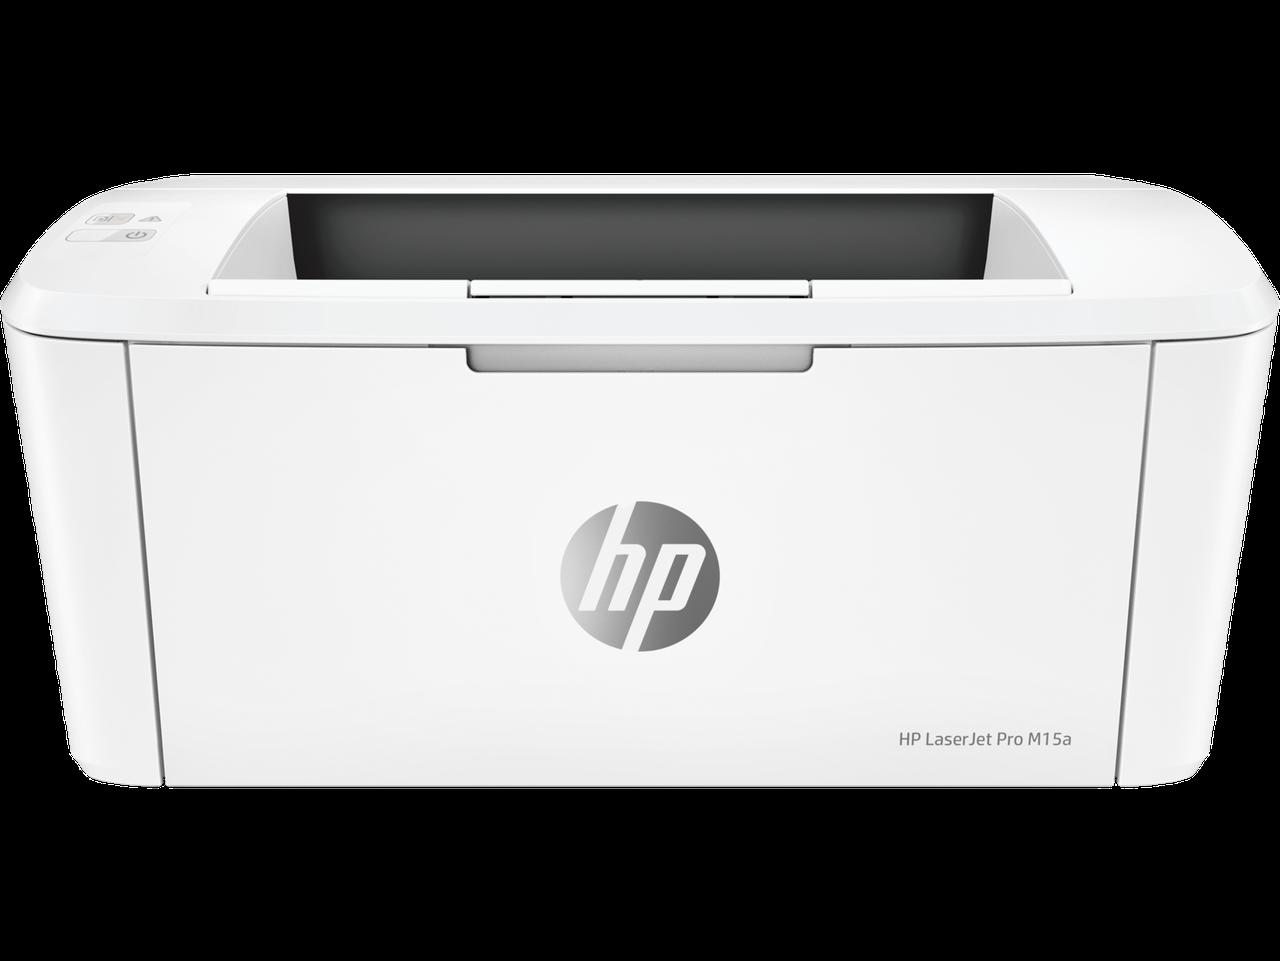 HP W2G50A Принтер лазерный черно-белый LaserJet Pro M15a (A4)